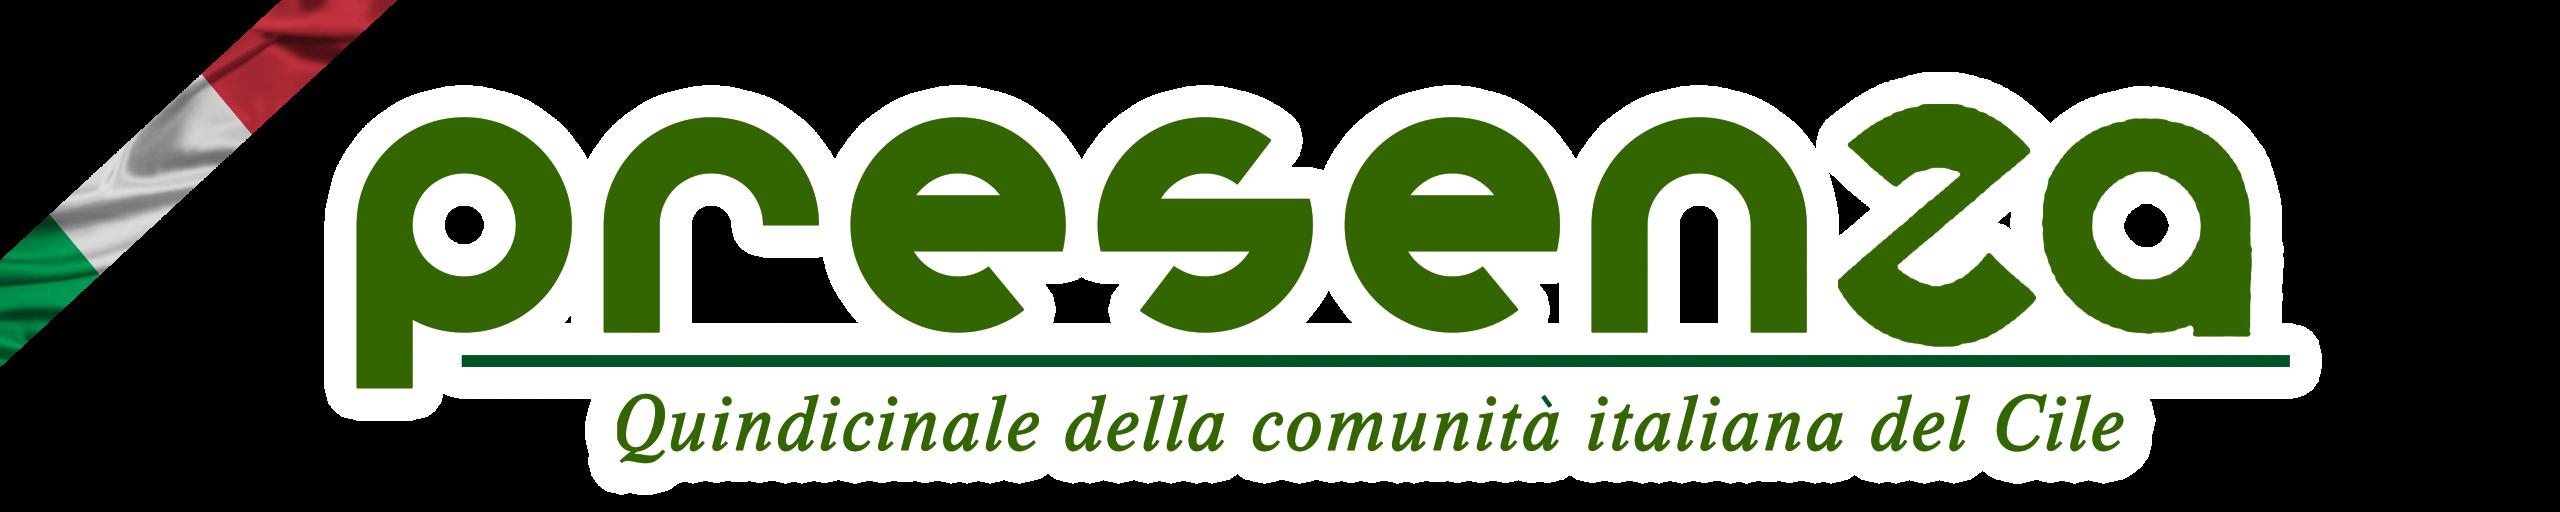 """Presenza, quindicinale della Comunità"": edición número 1000"